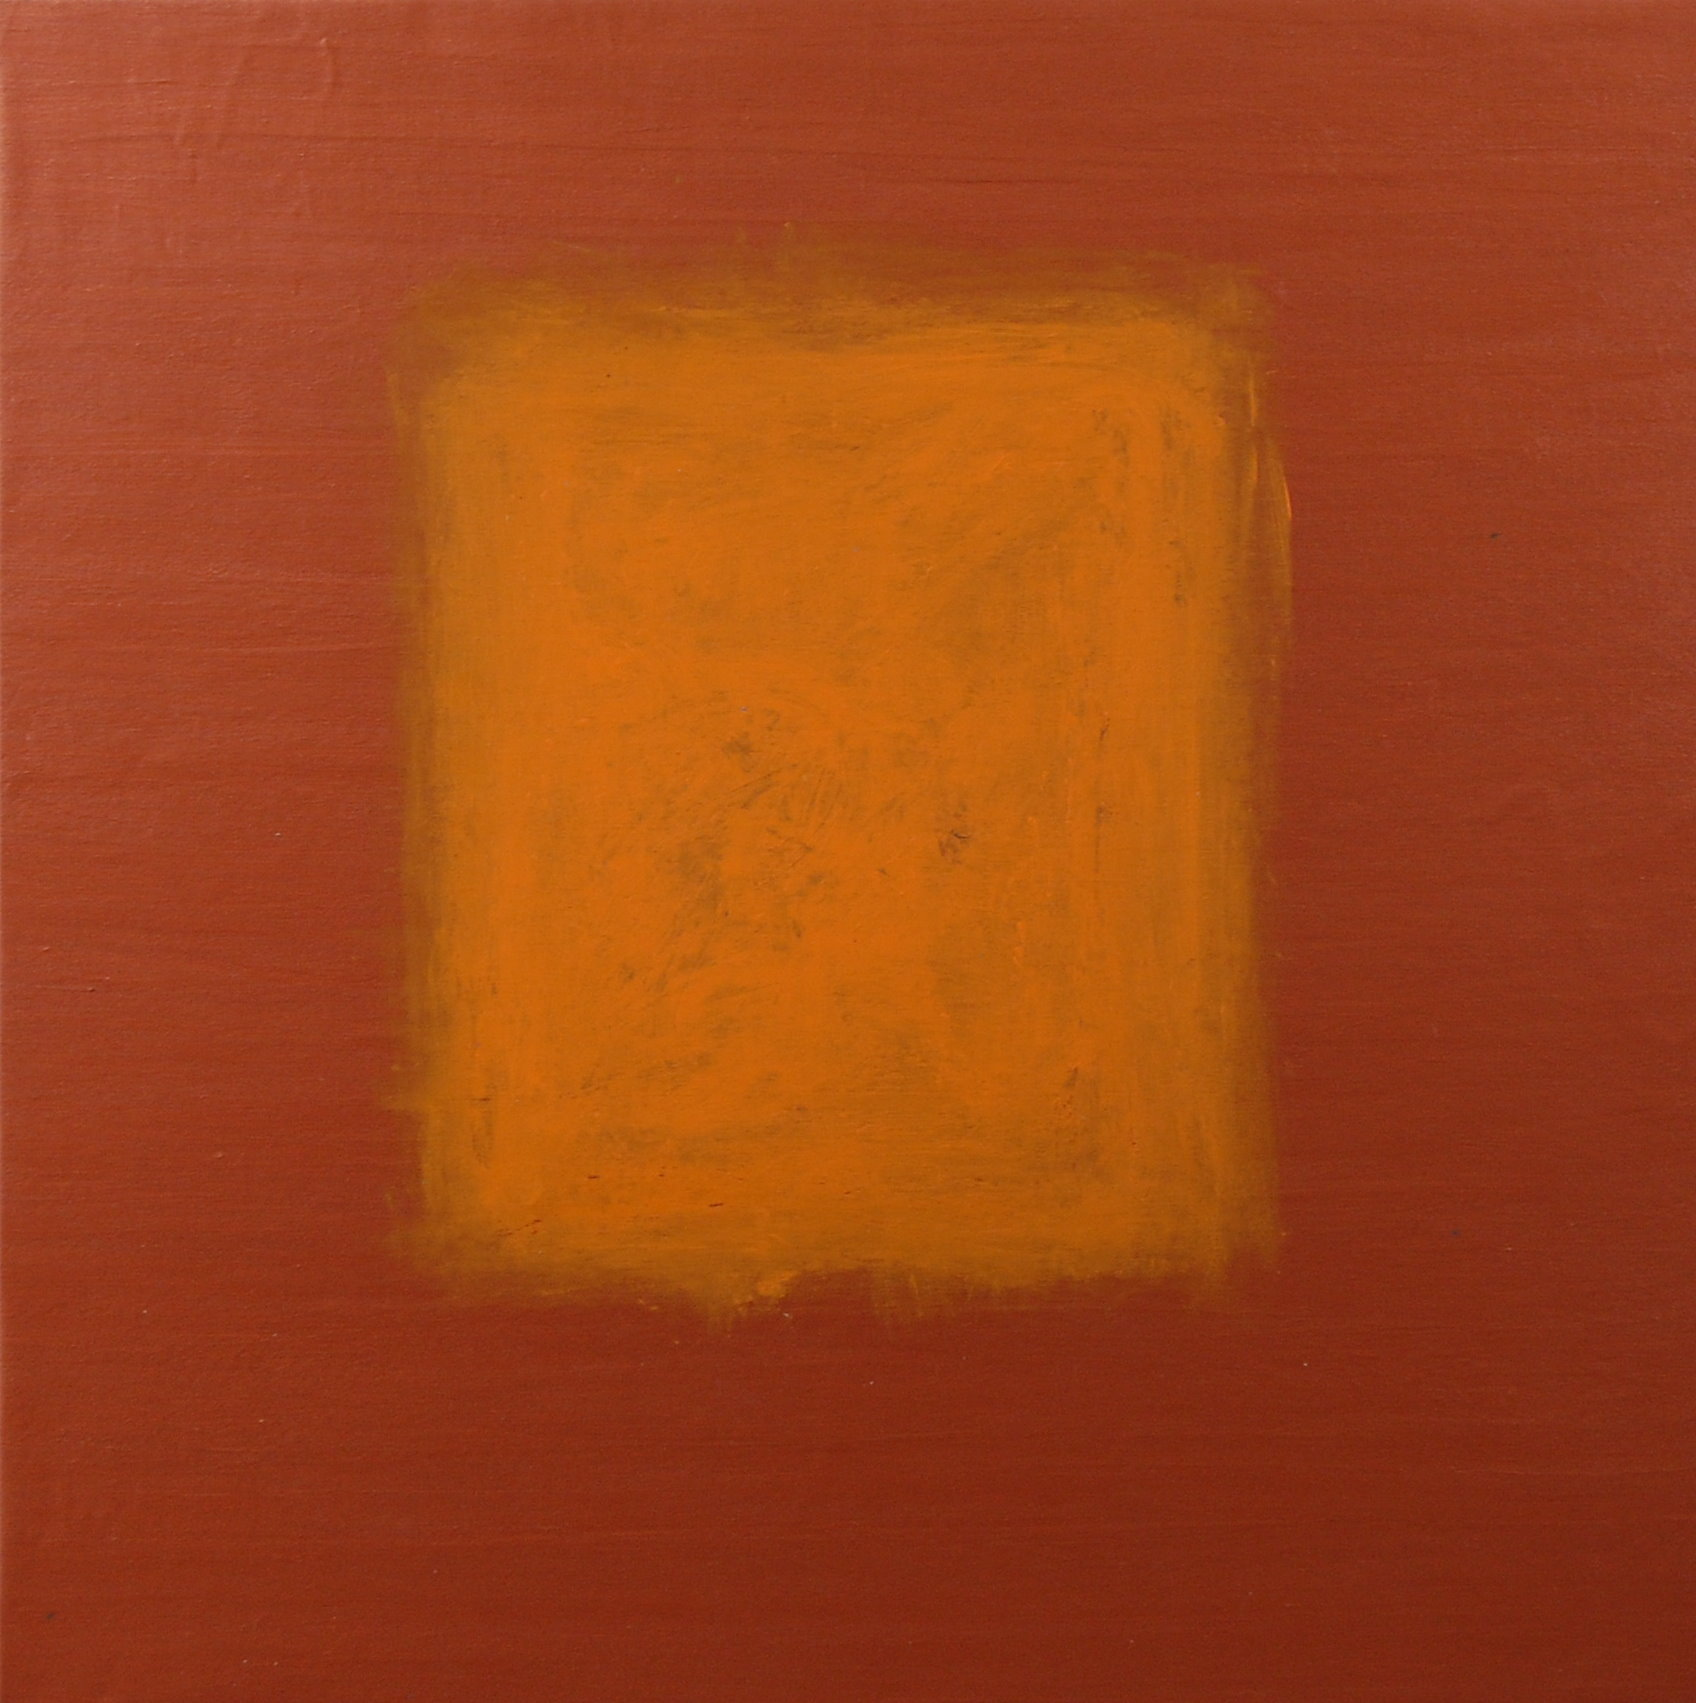 orange on copper.jpg